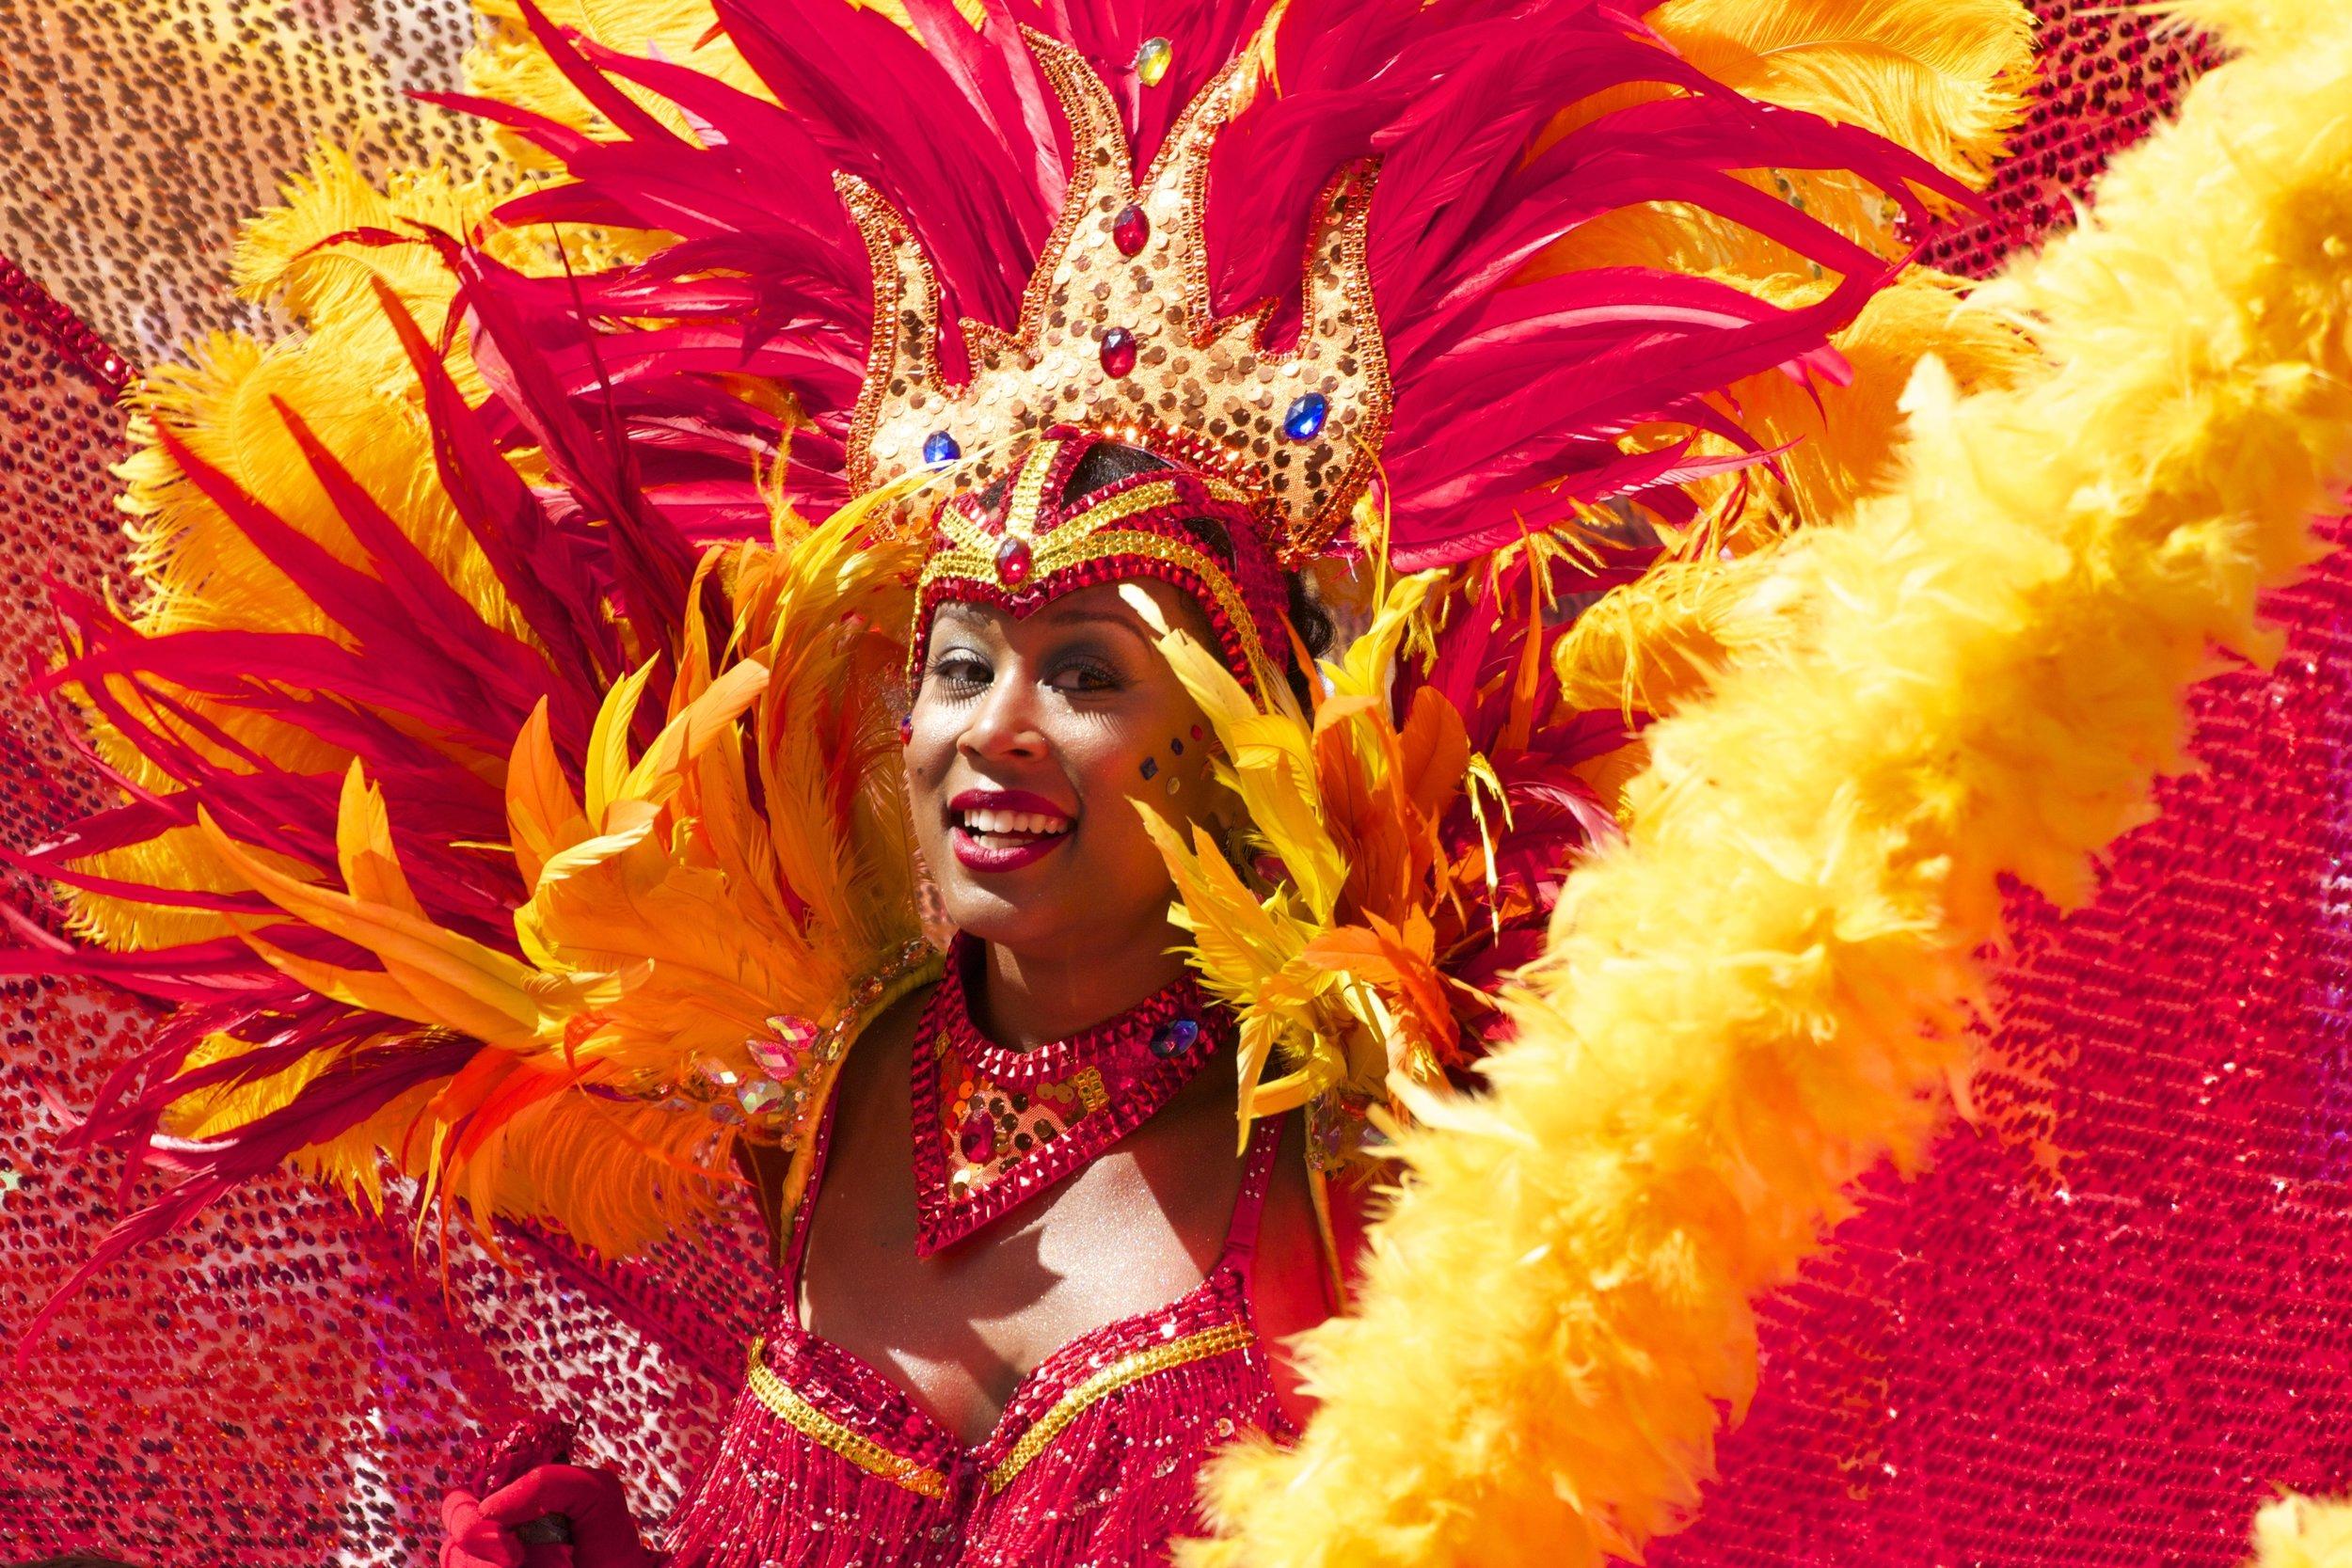 brazil-cariwest-carnival-48796 (2).jpg